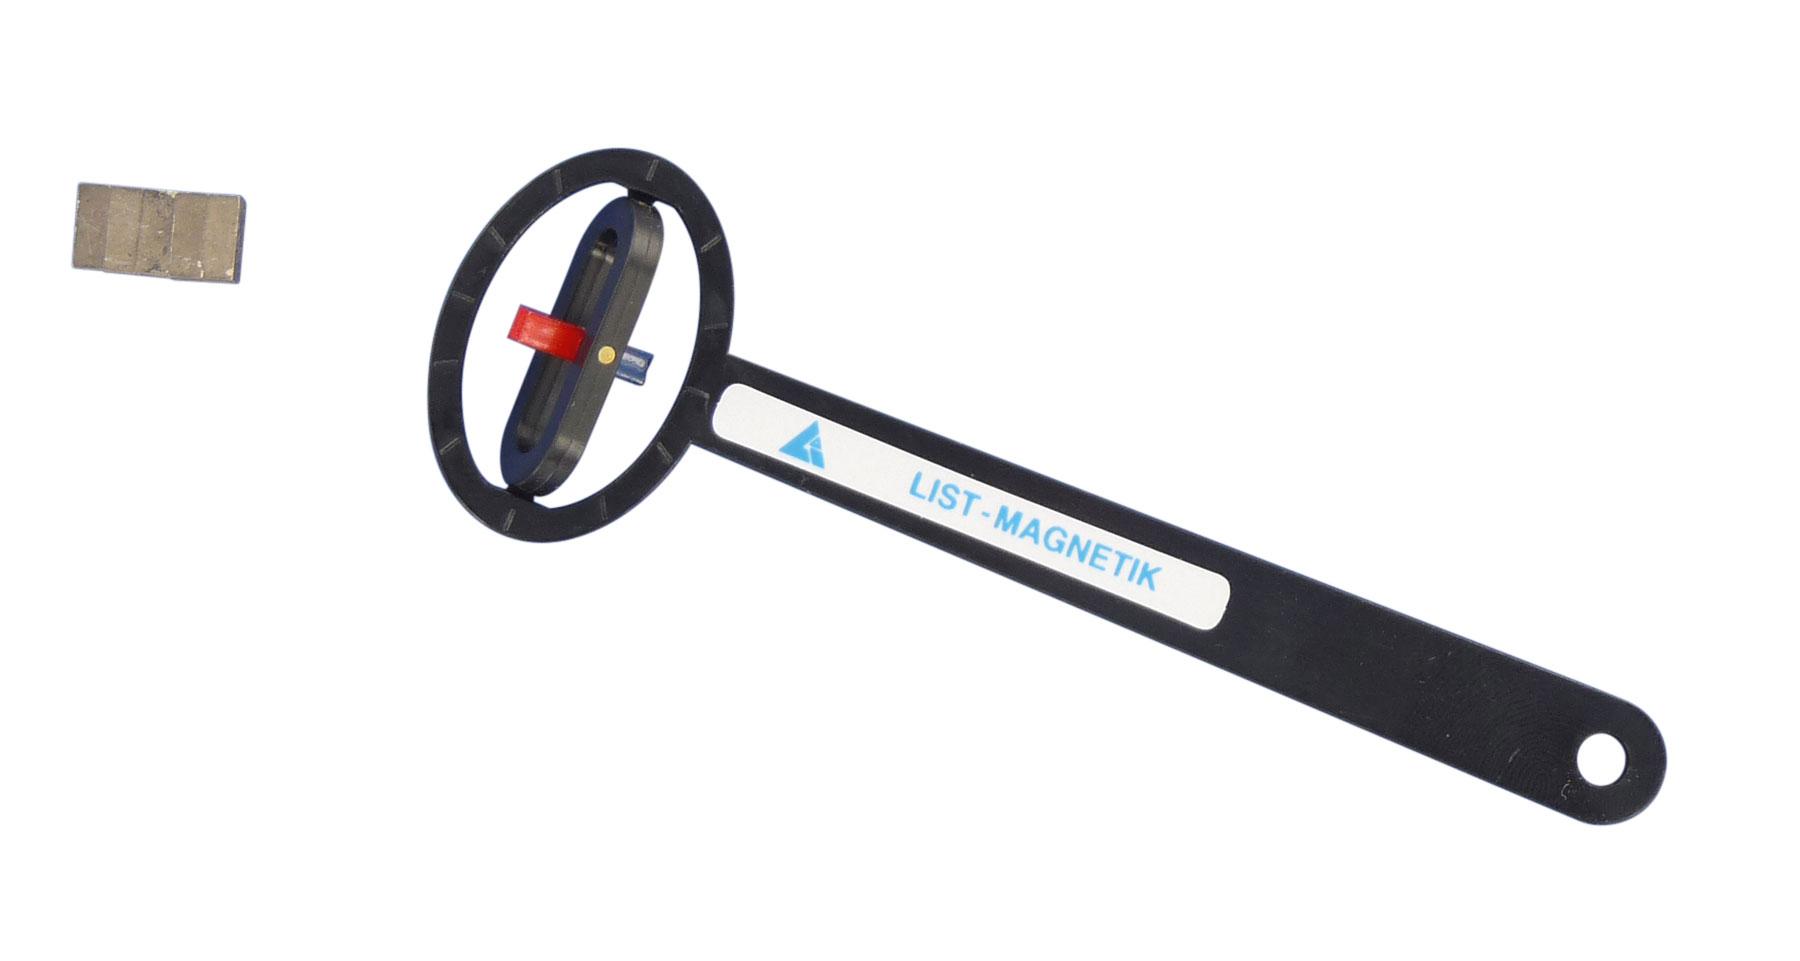 Magnet Pole Detector M-8 | List-Magnetik